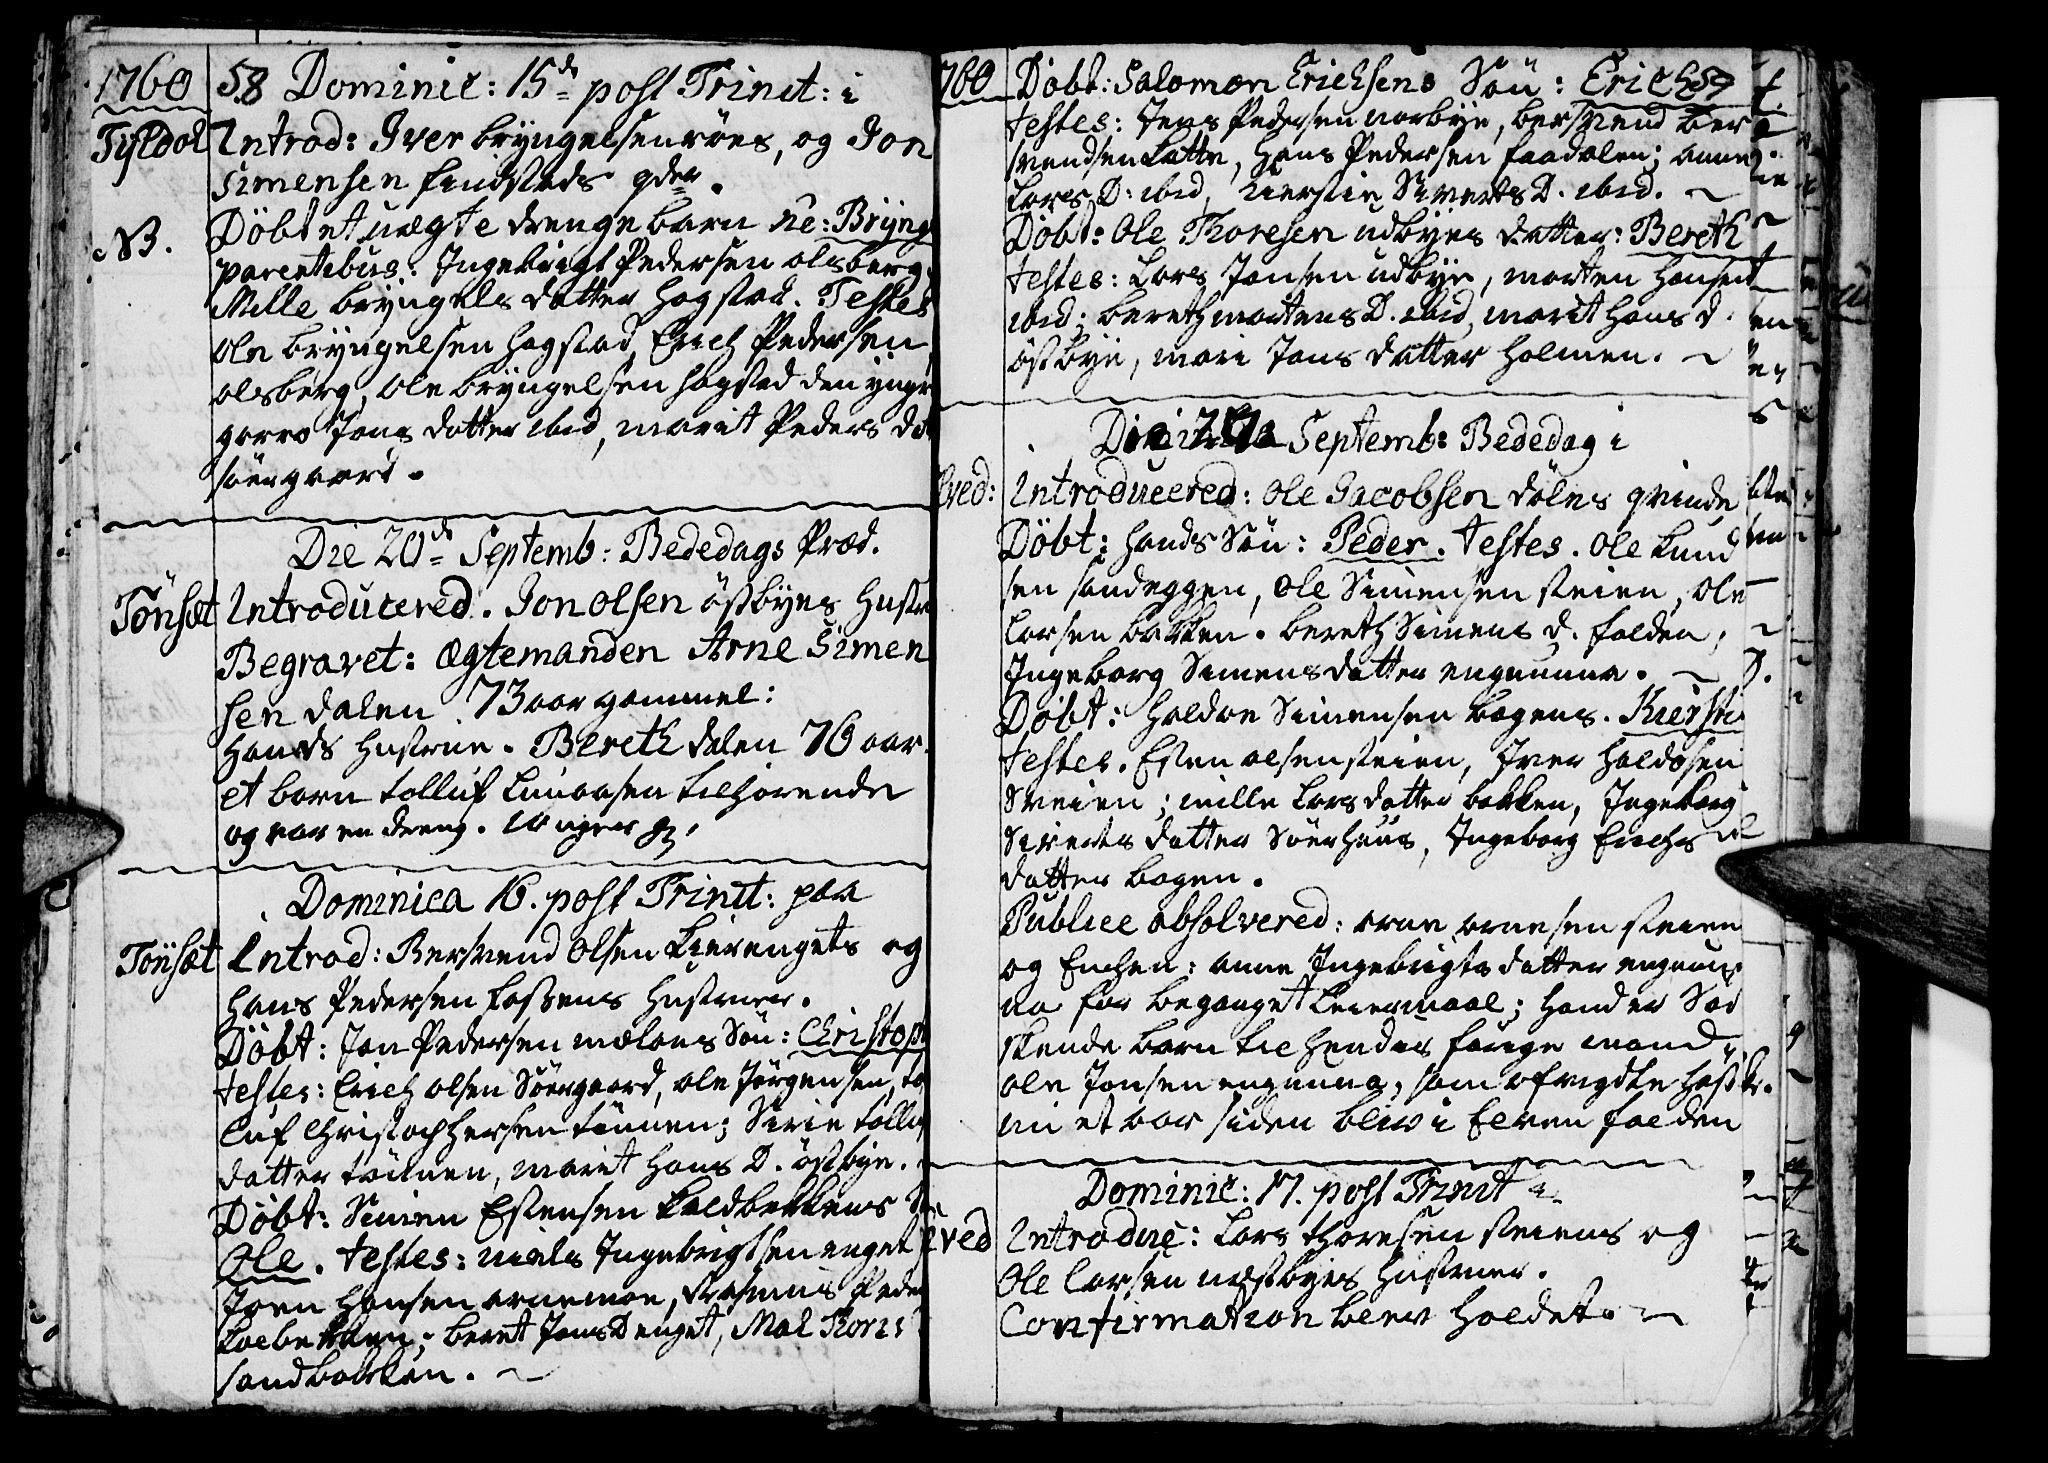 SAH, Tynset prestekontor, Ministerialbok nr. 3, 1758-1762, s. 58-59